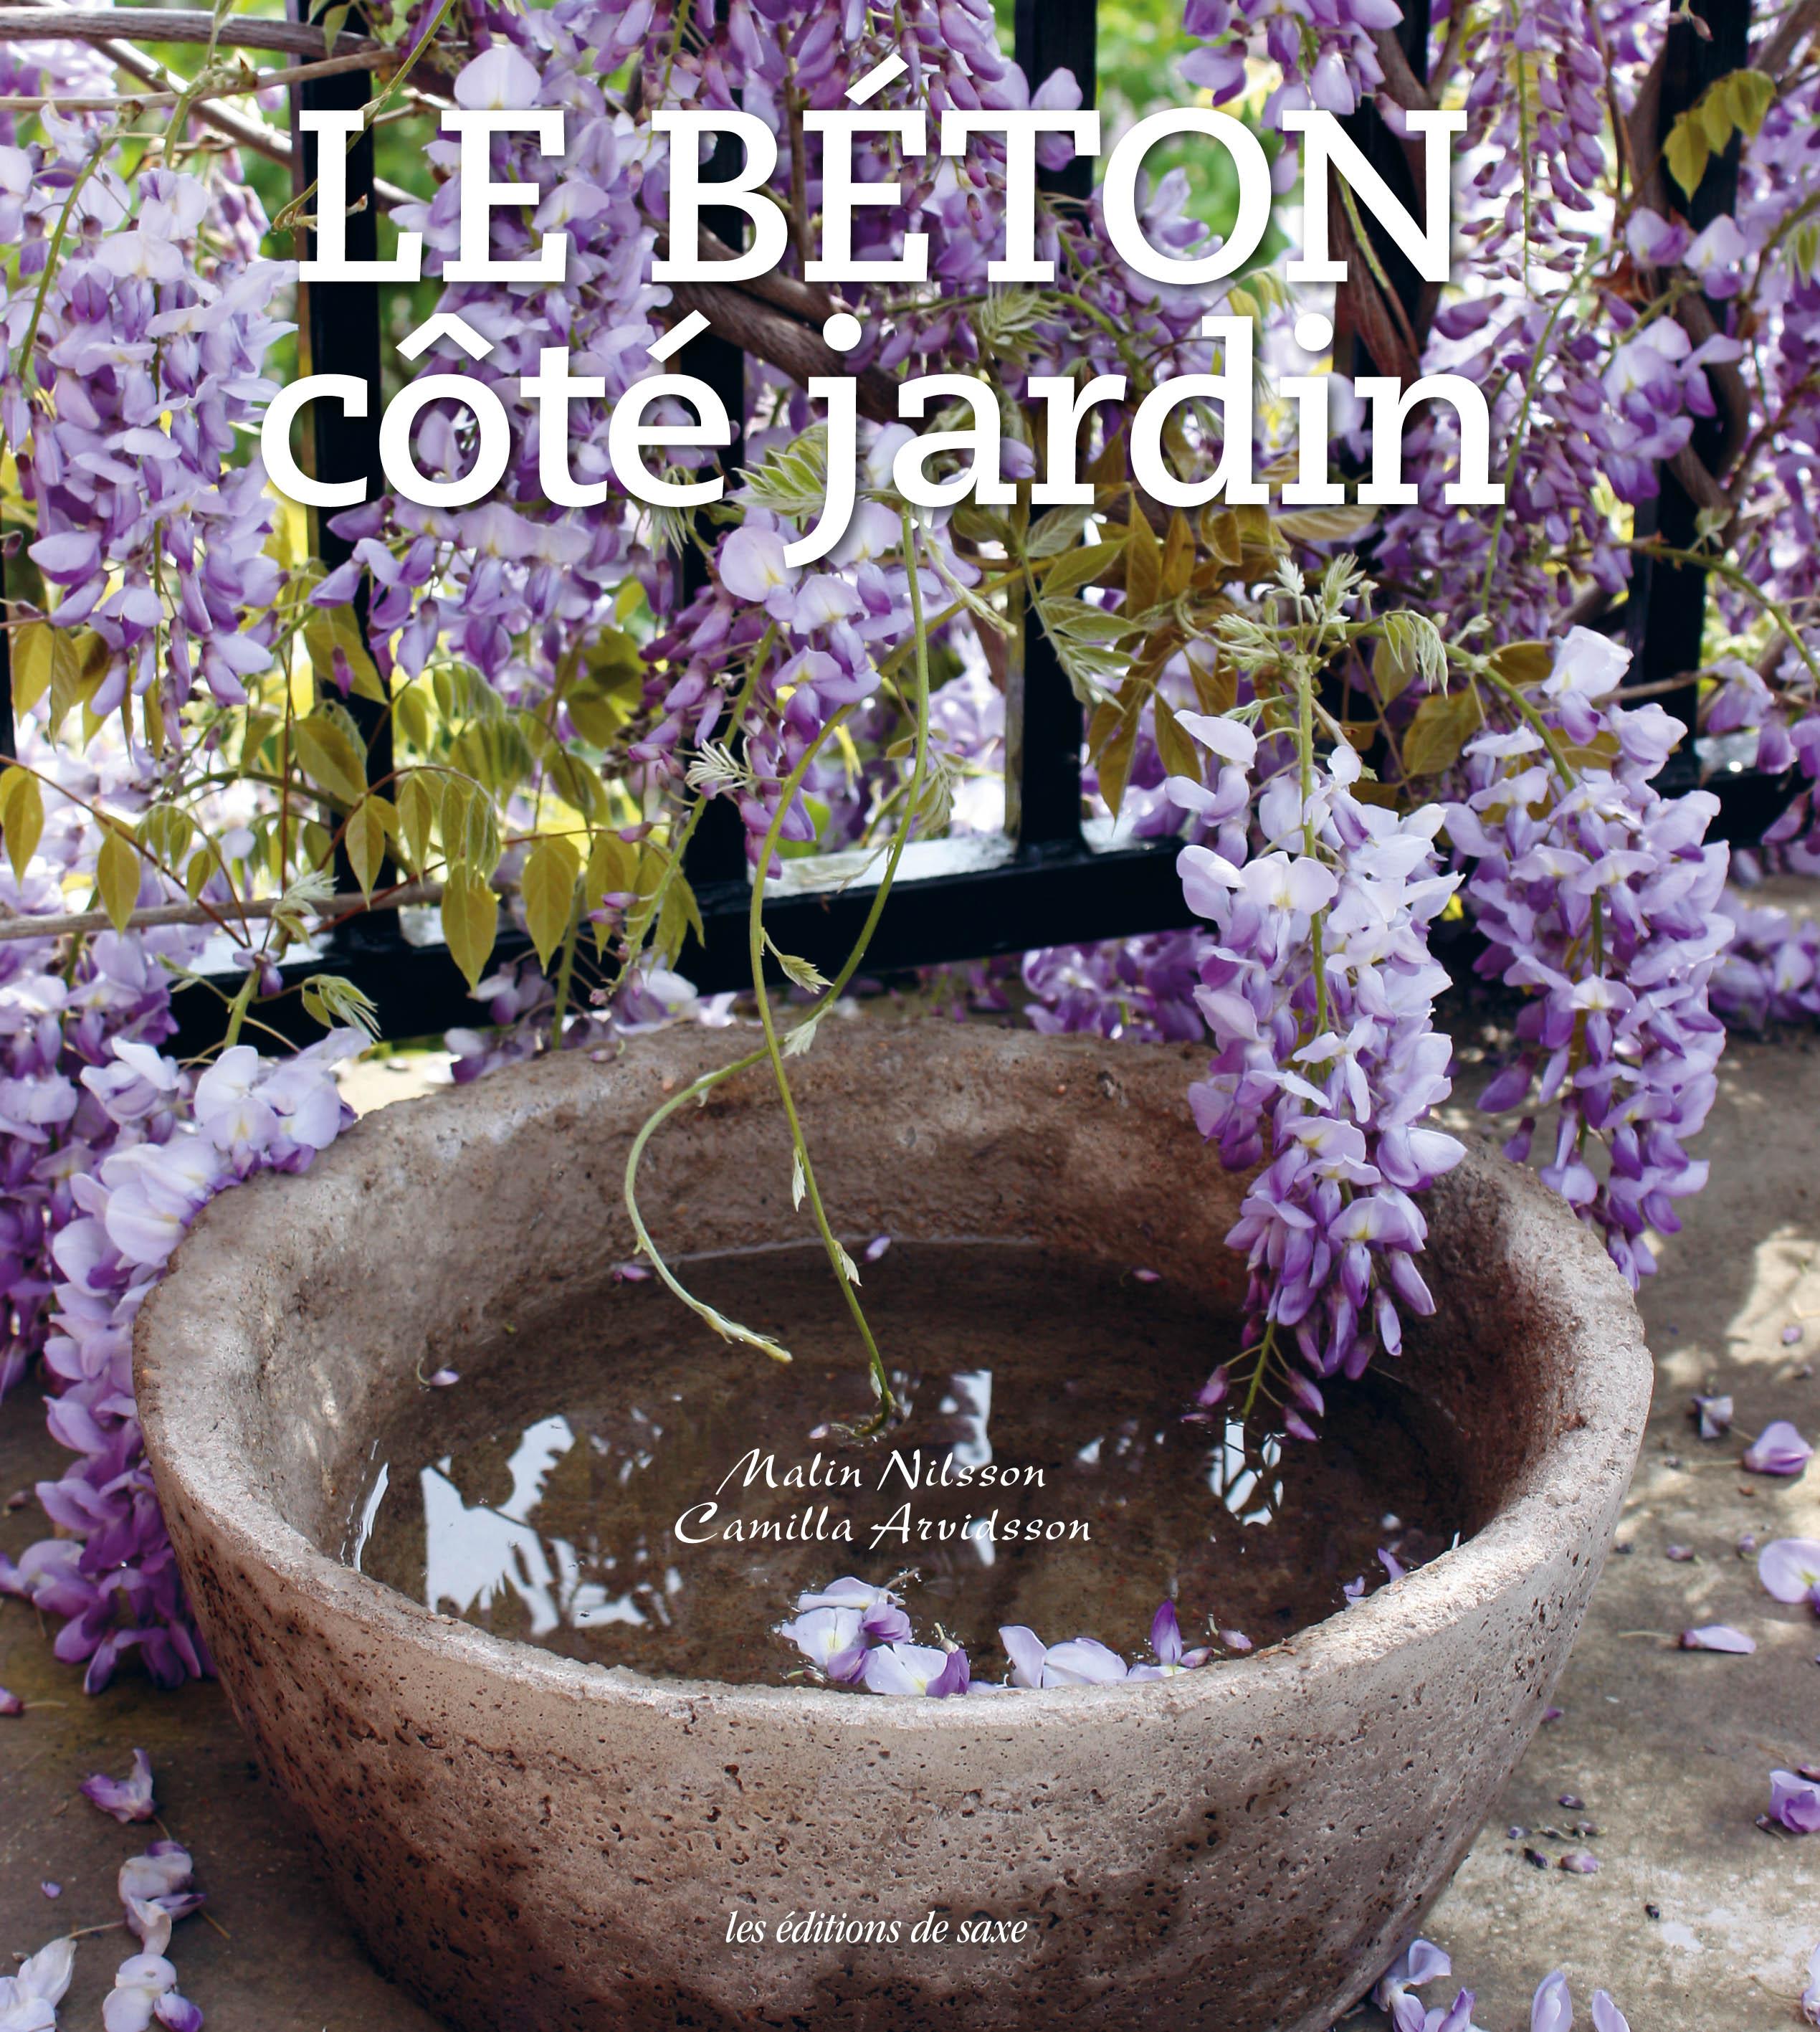 Best Bassin De Jardin En Beton Images - House Design - marcomilone.com